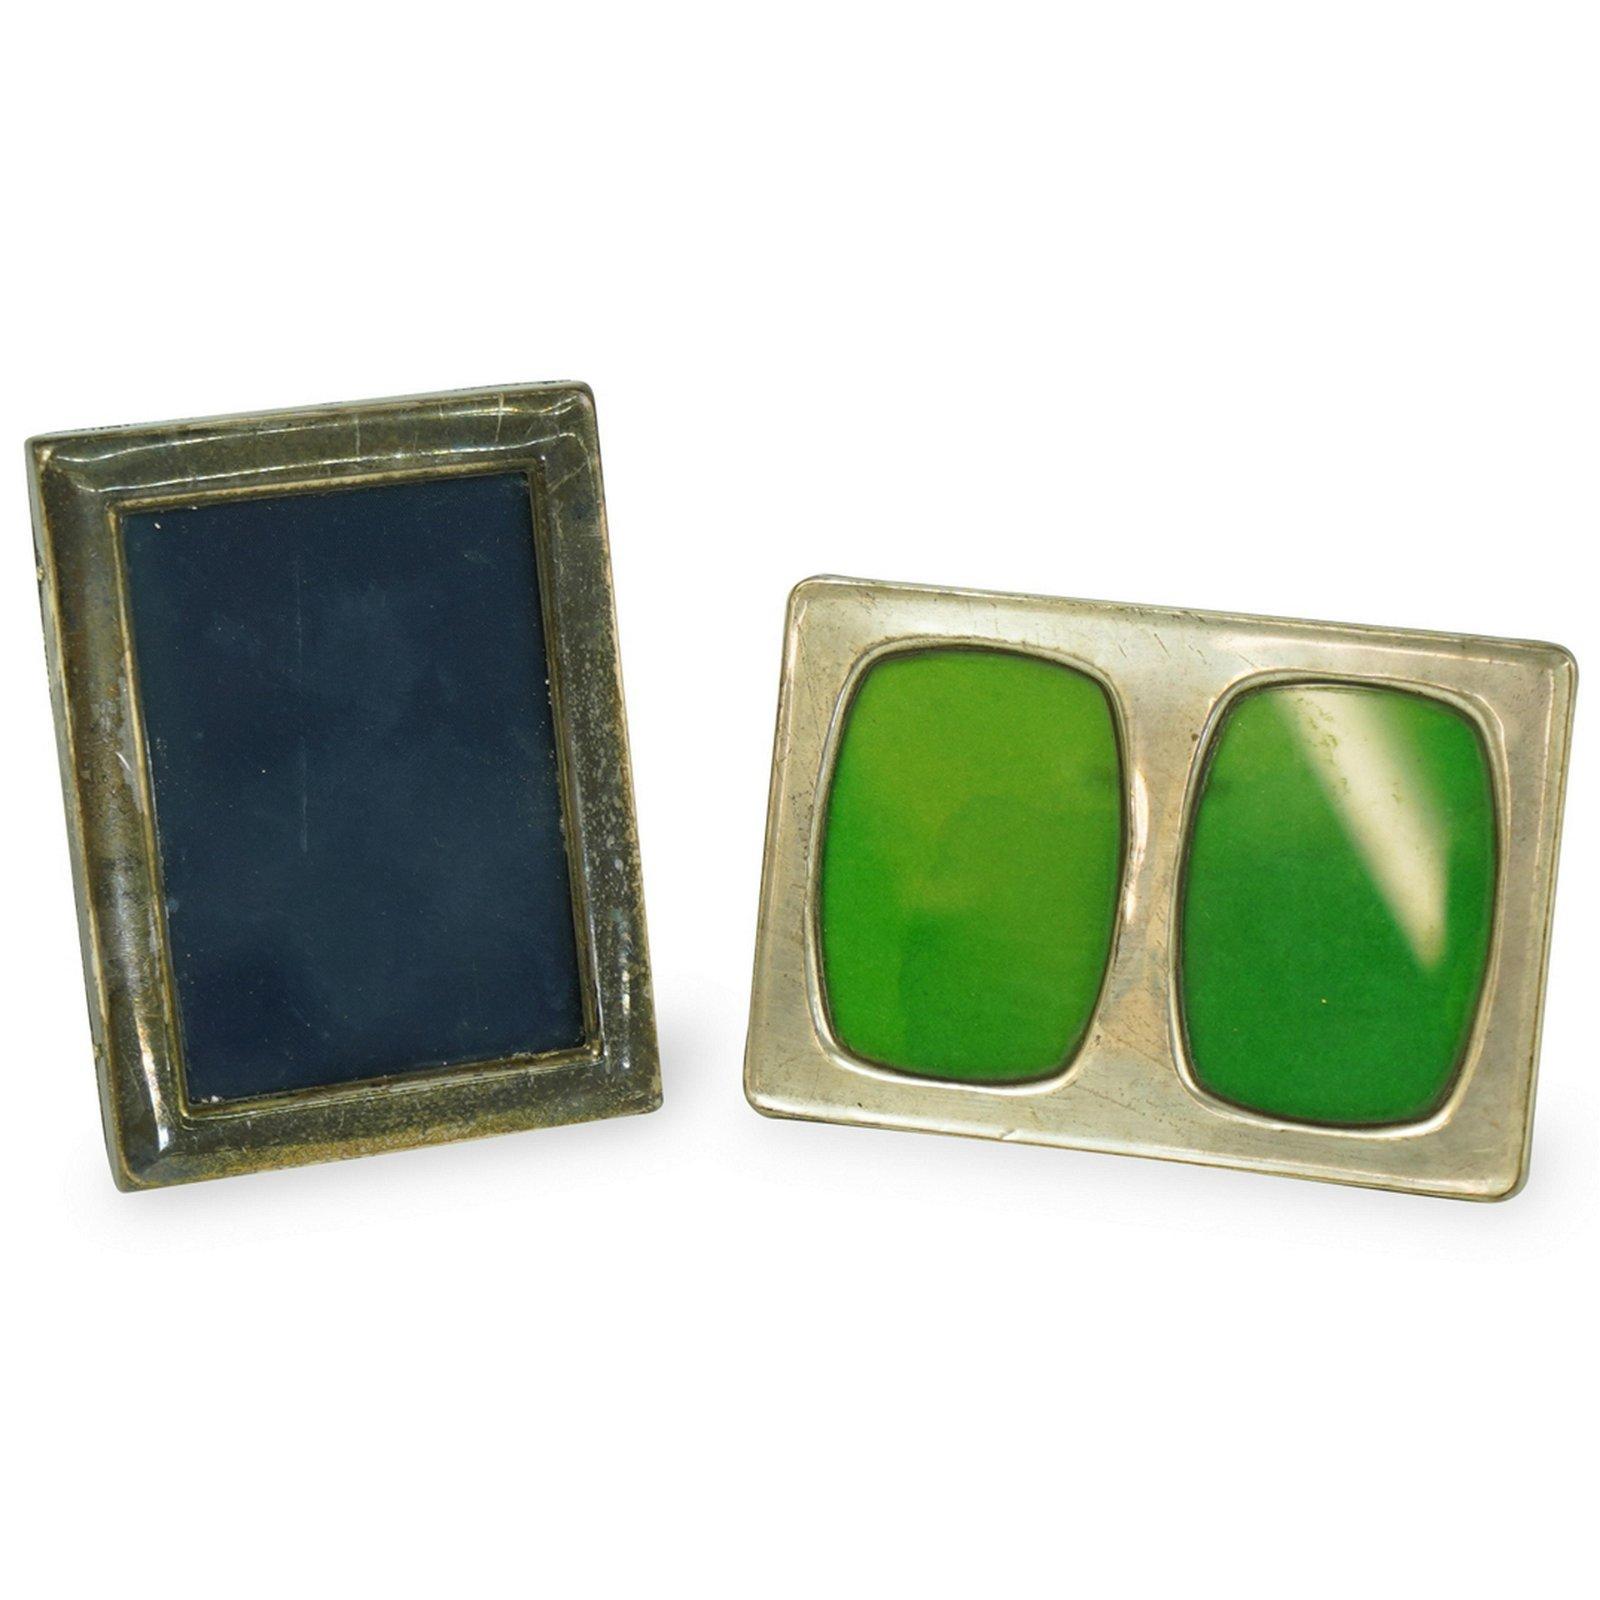 (2 Pc) Vintage Sterling Silver Picture Frames